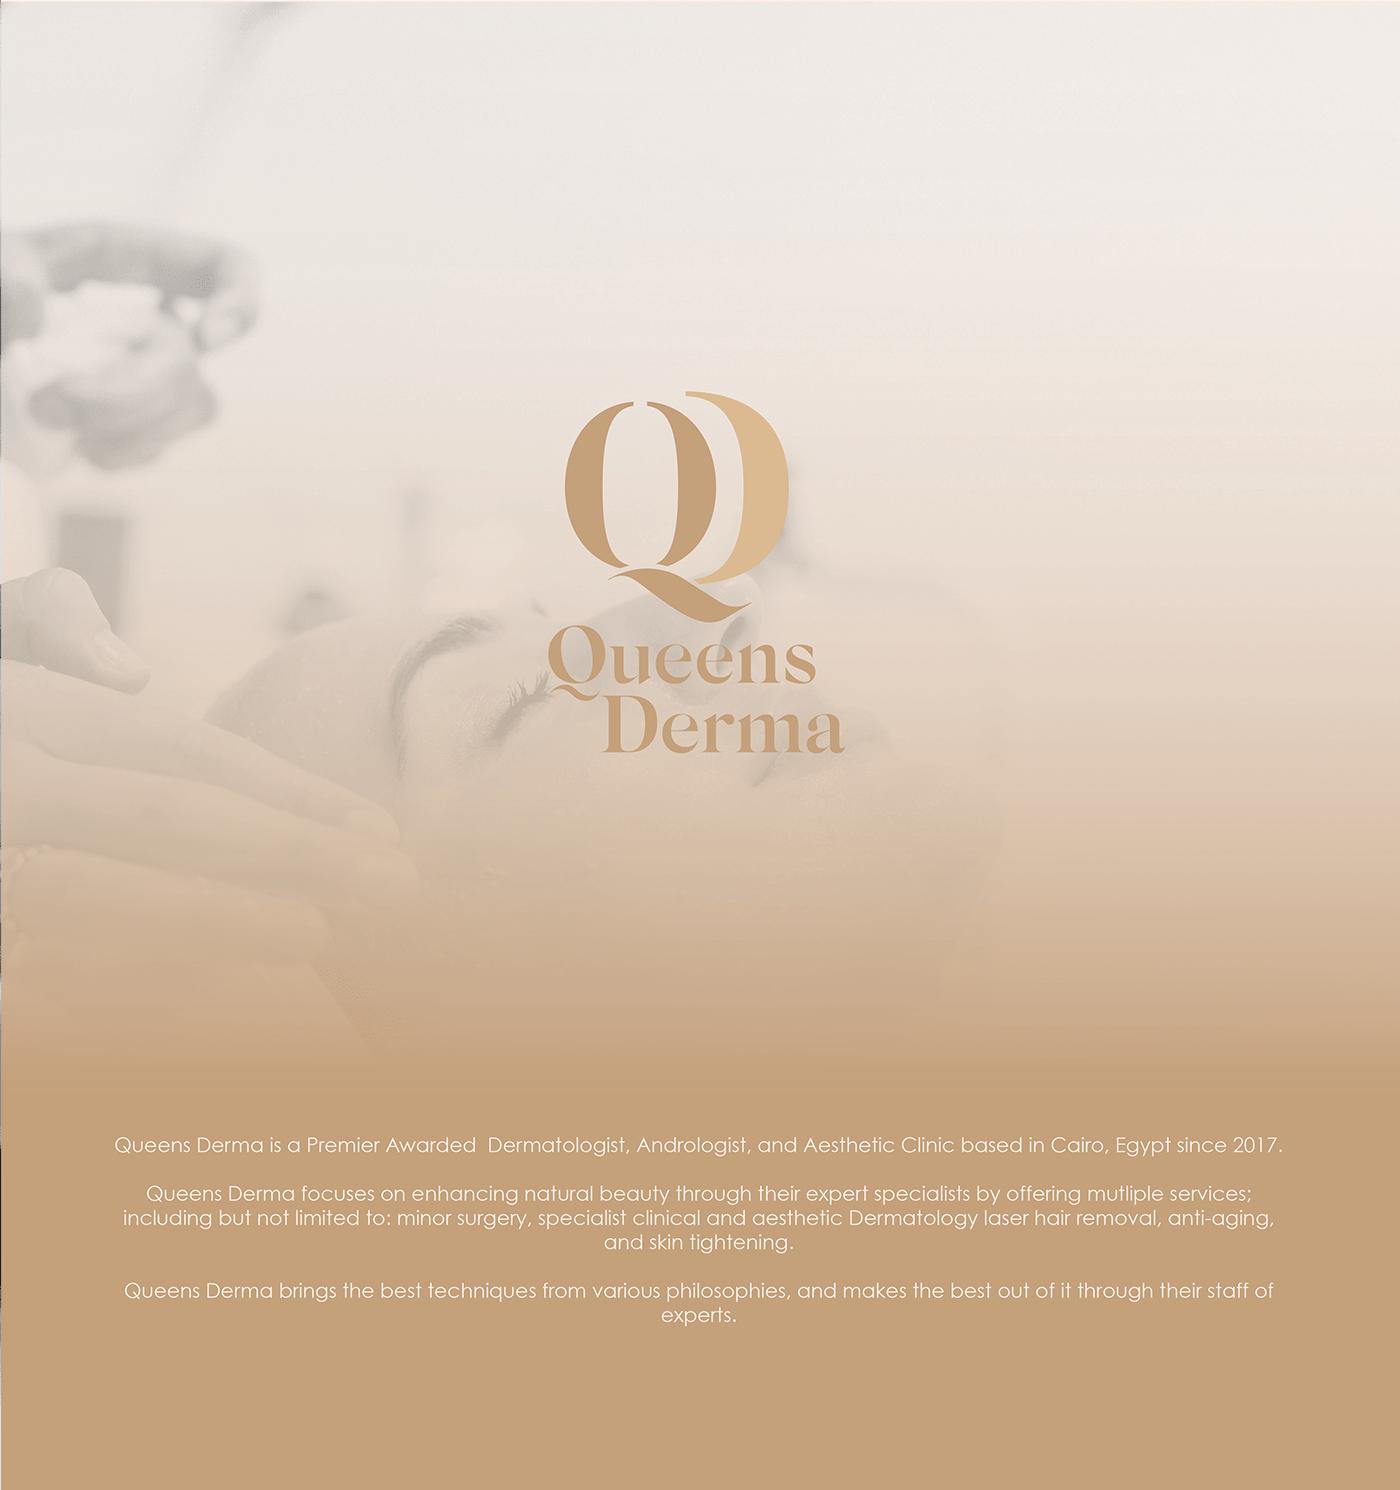 branding  clinic dermatologist doctor elegant medical branding nude colors Queens skincare Stationery